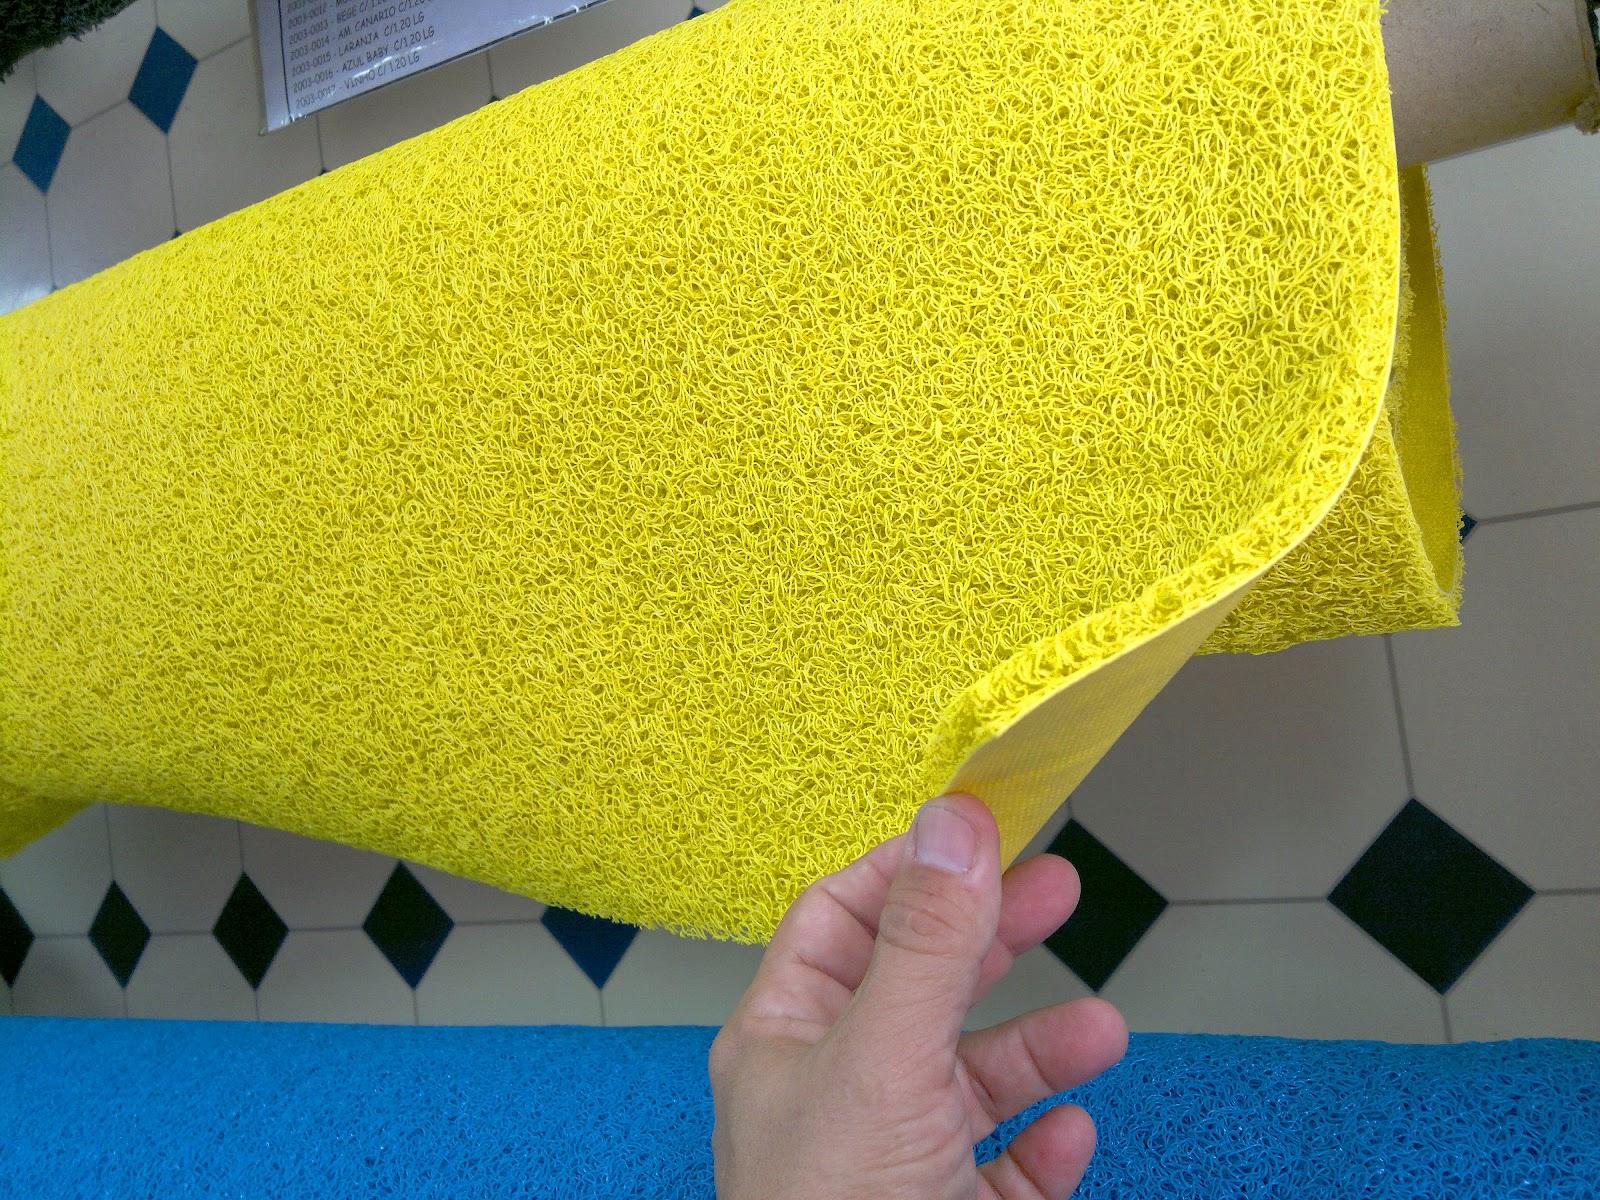 #046BB6 Dicas do Gilson Eletricista: Os pingos de água do meu ar condicionado  1496 Tirar Mancha Janela De Aluminio